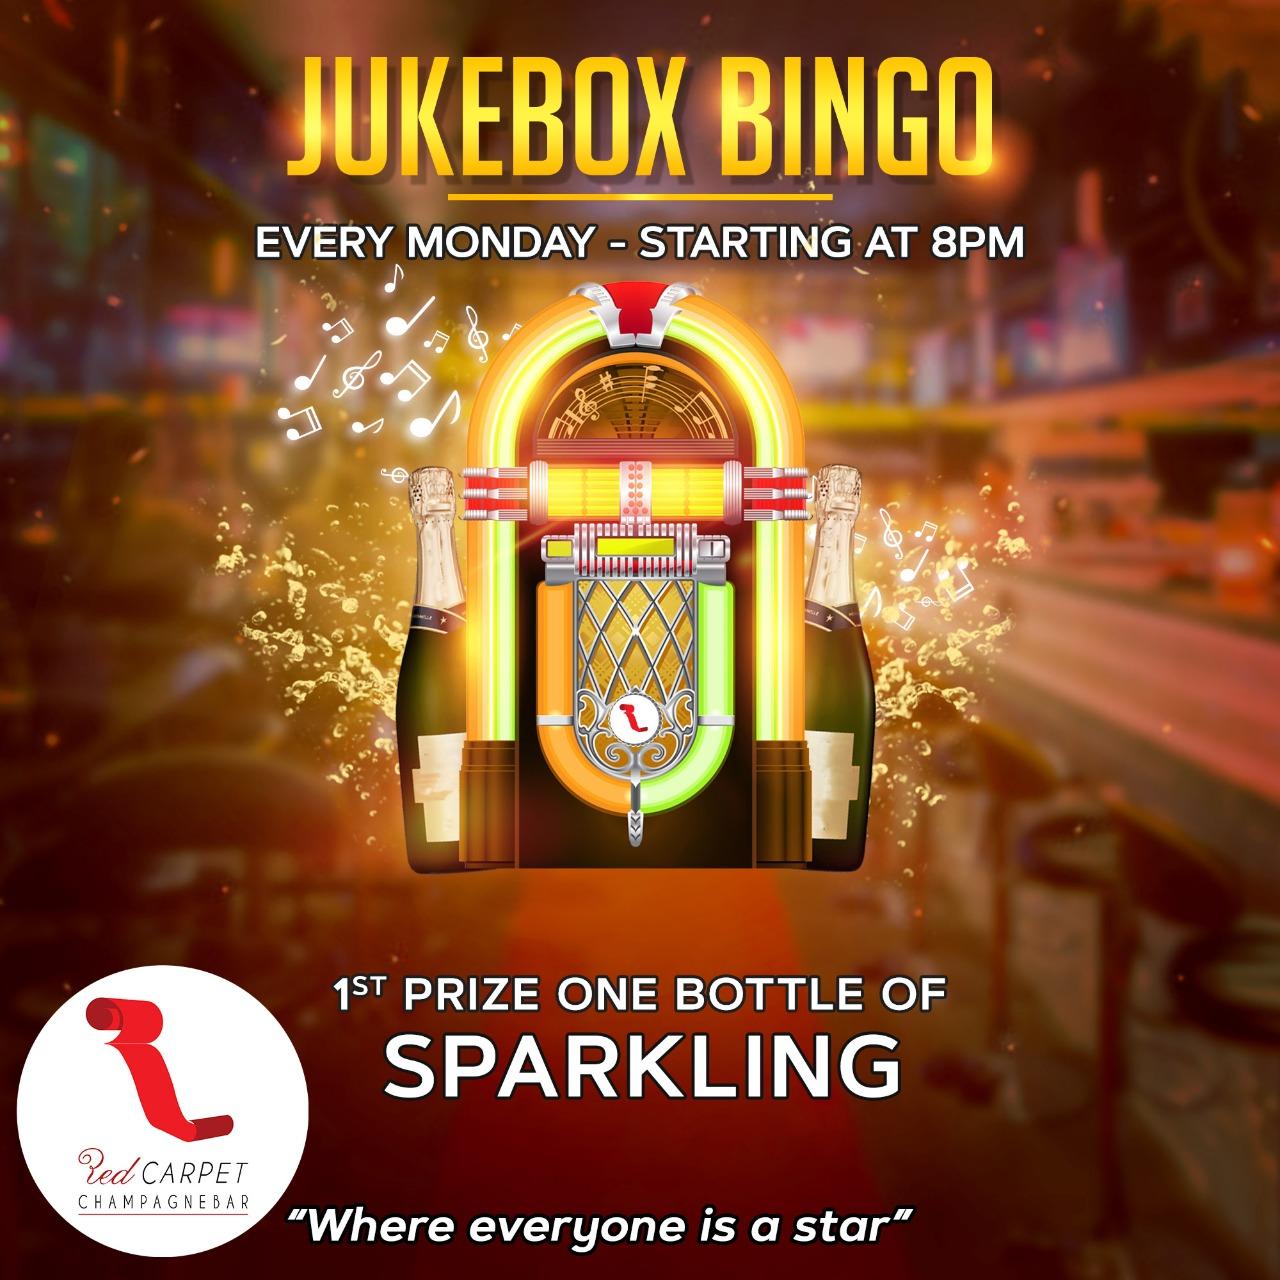 jukebox_bingo